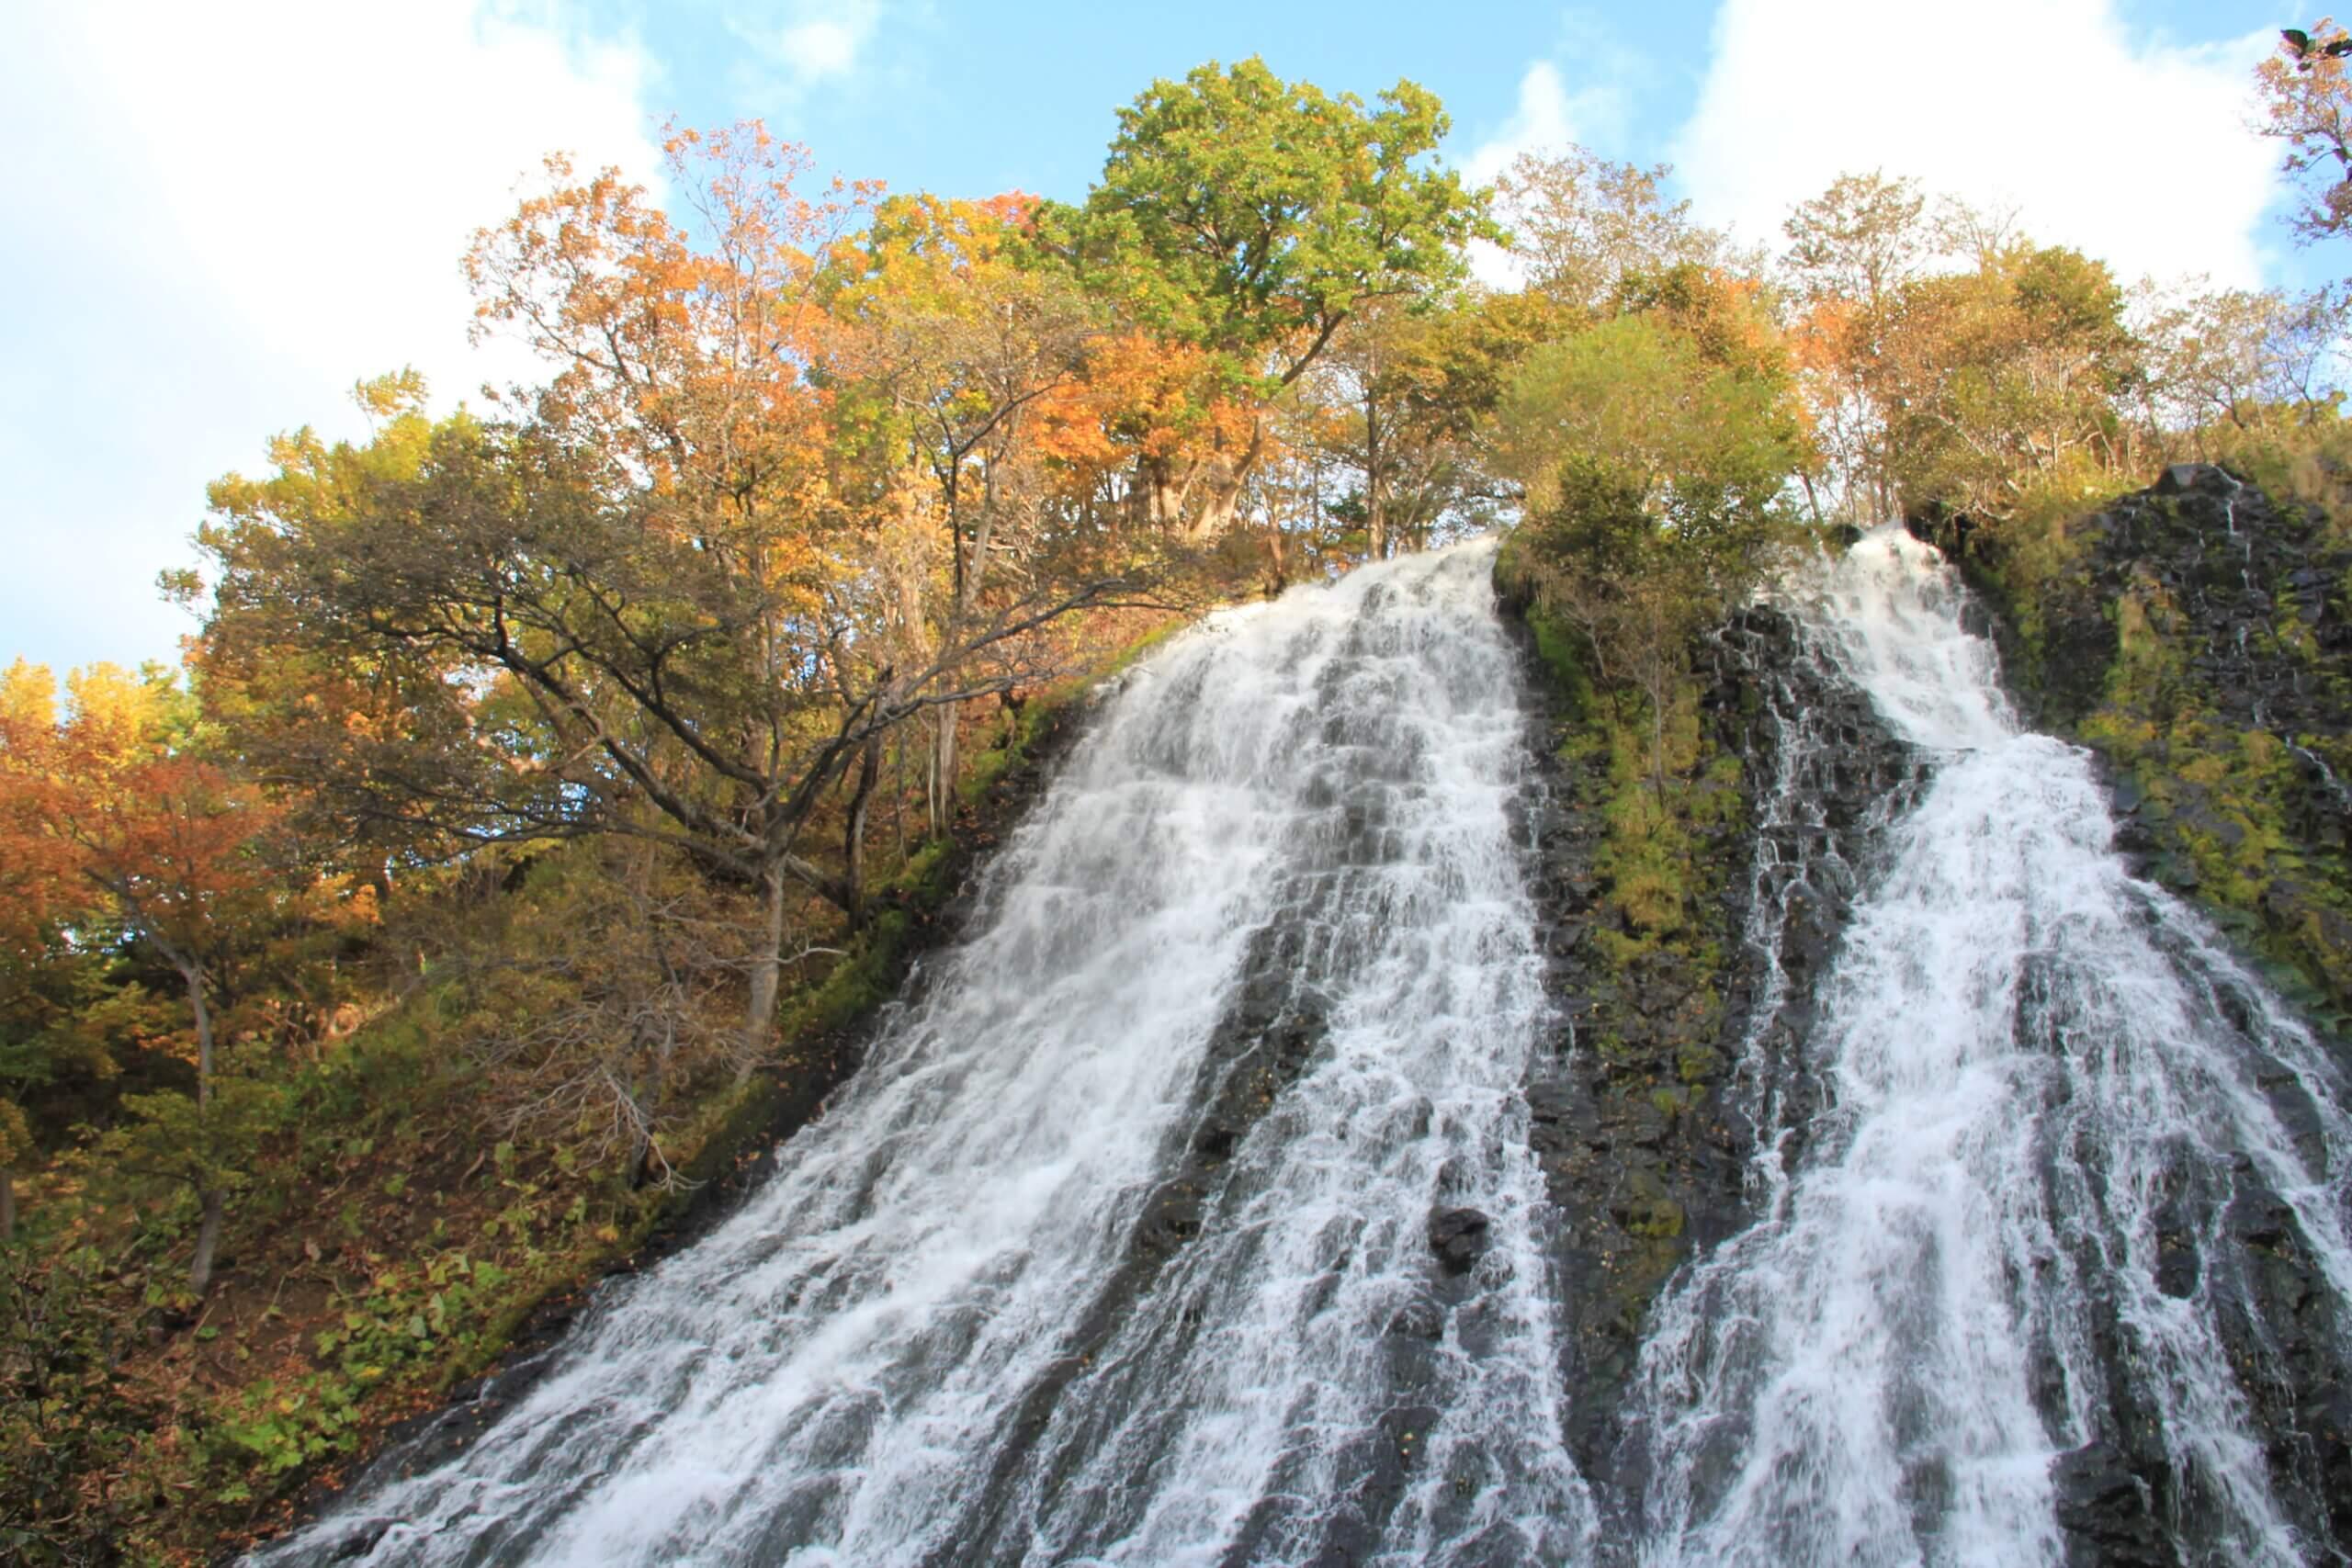 Oshinkoshin瀑布:日本百大瀑布之一的雙美瀑布